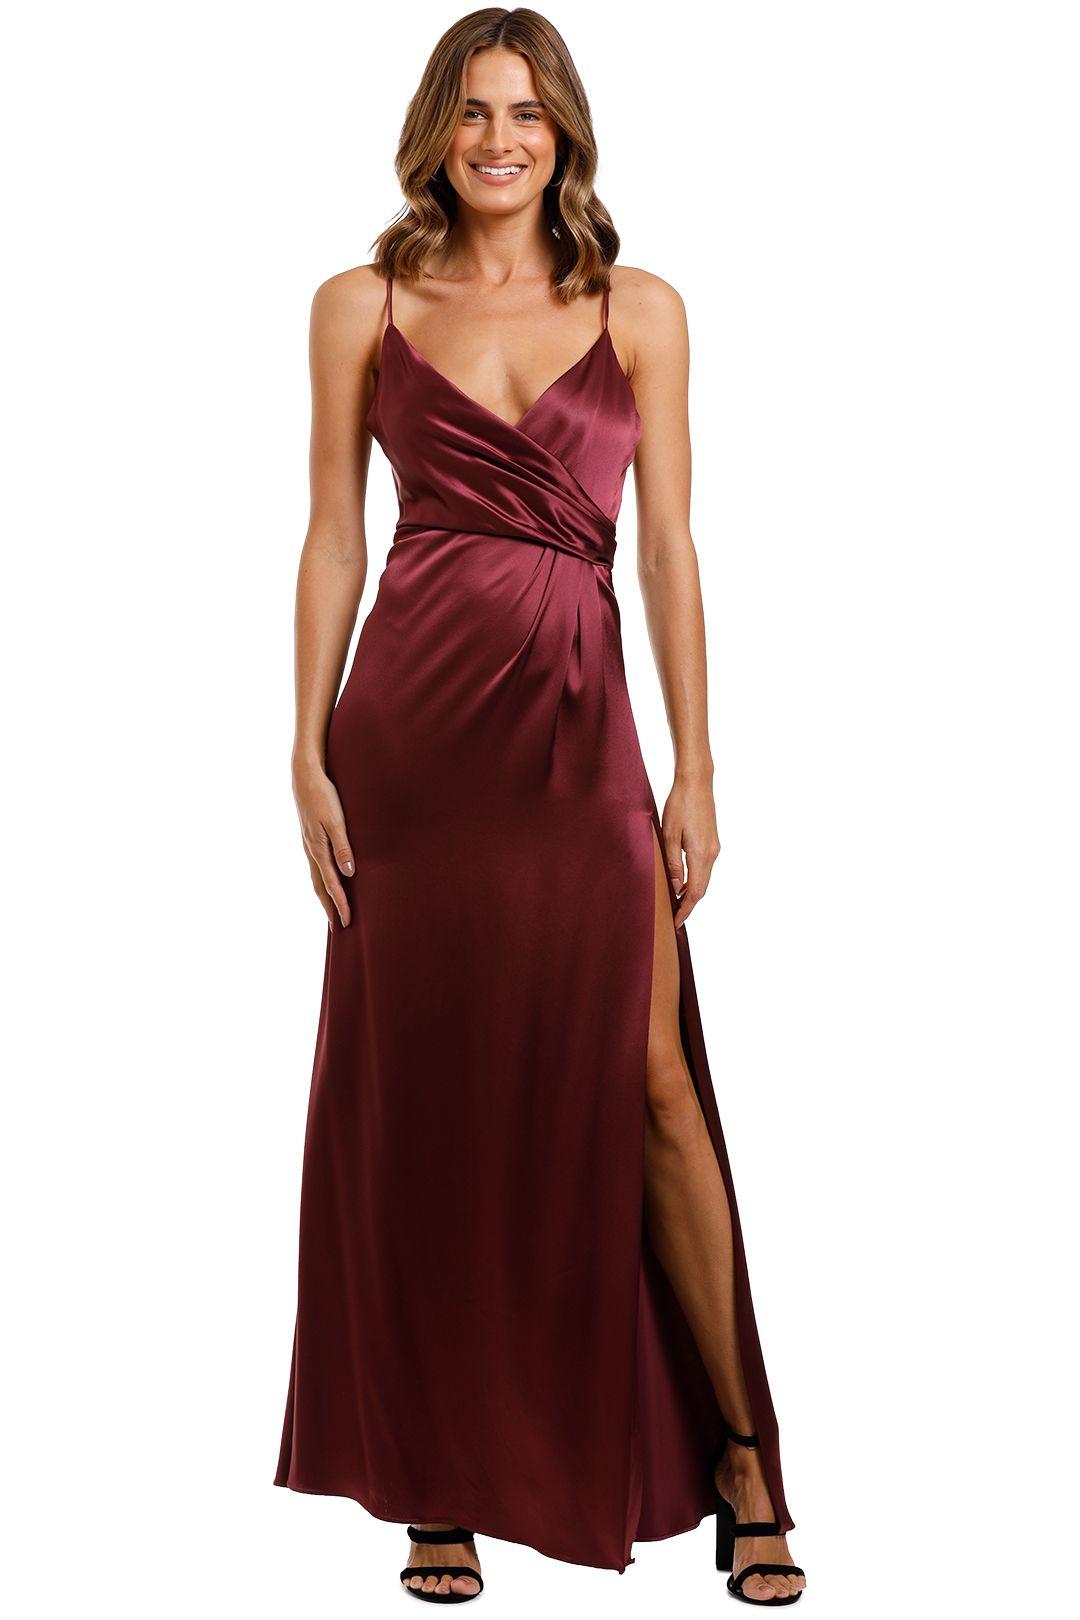 Jill Jill Stuart Slip Gown Burgundy